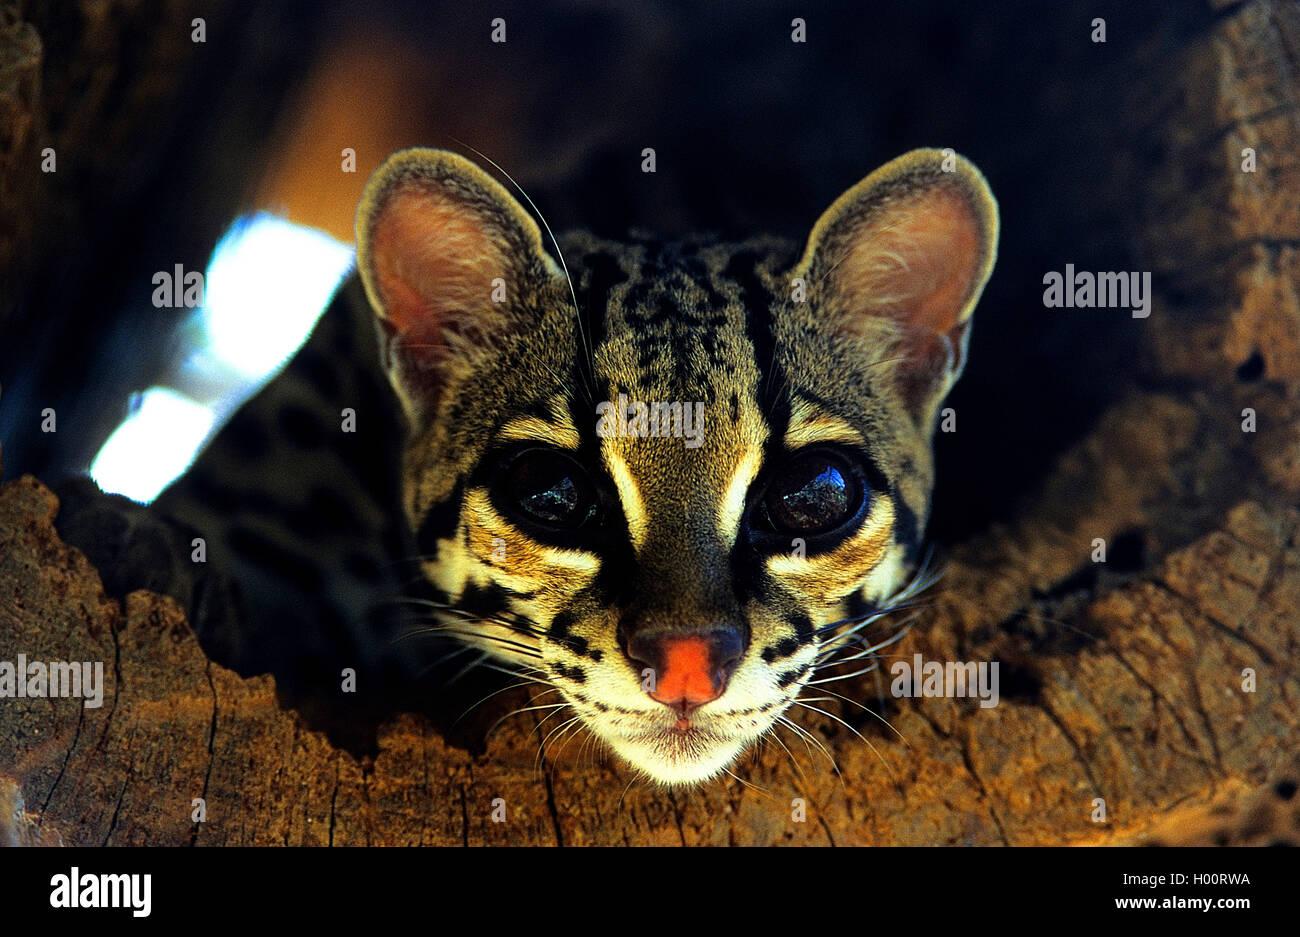 Langschanzkatze, Langschwanz-Katze, Peludo, Margay, Bergozelot, Berg-Ozelot, Baumozelot, Baum-Ozelot (Leopardus - Stock Image